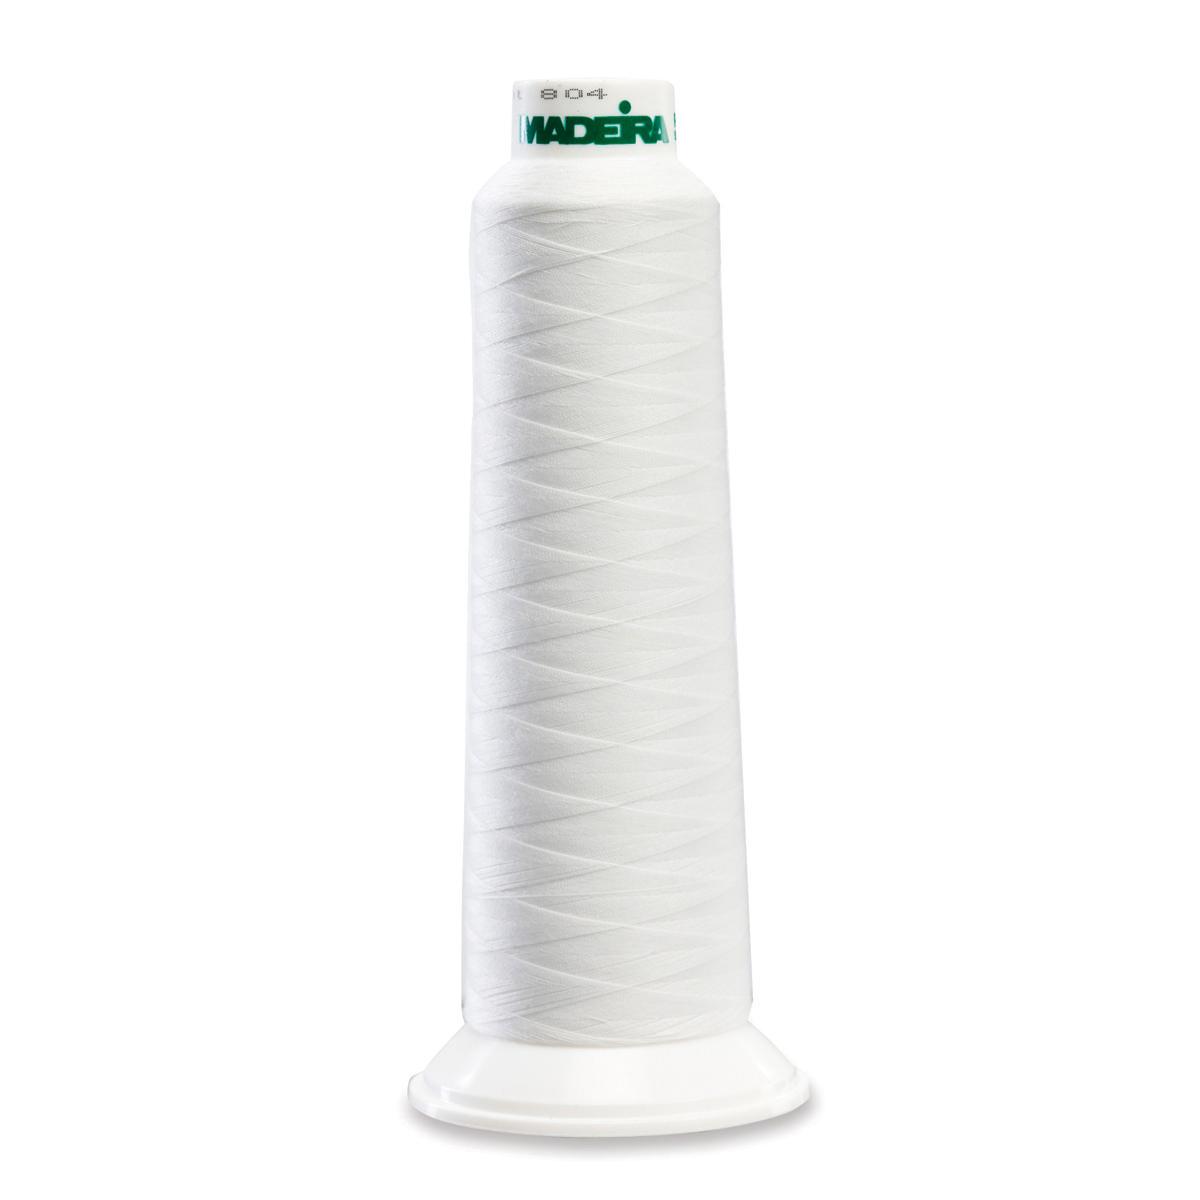 8010 White Poly Serger Thread Madeira Aerolock